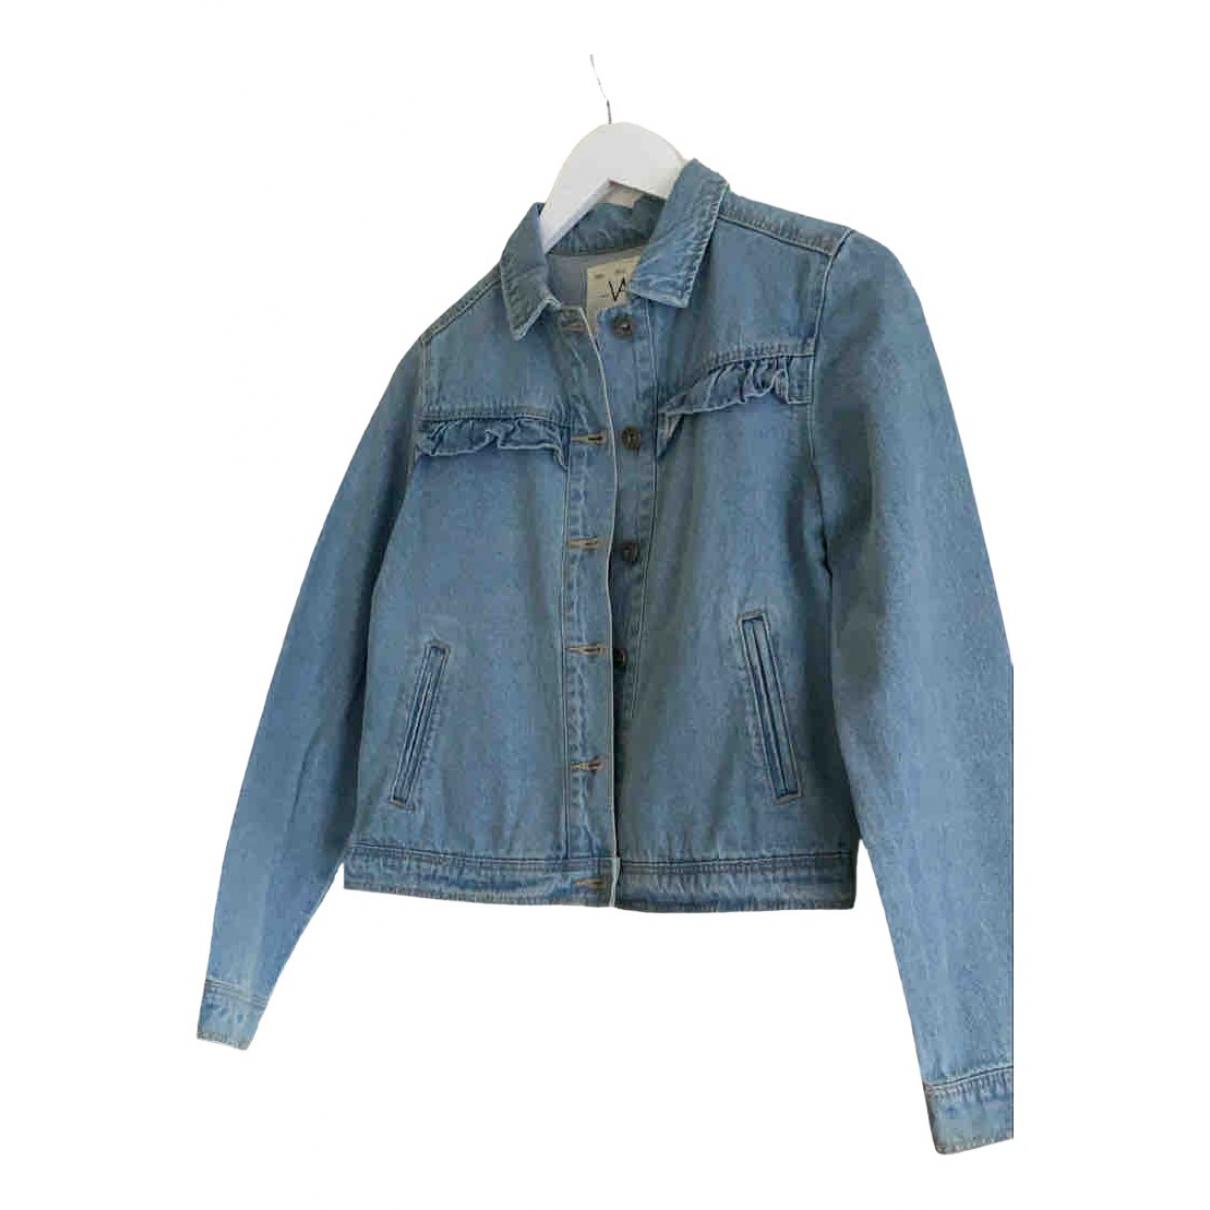 Ikks \N Jacke in  Blau Denim - Jeans